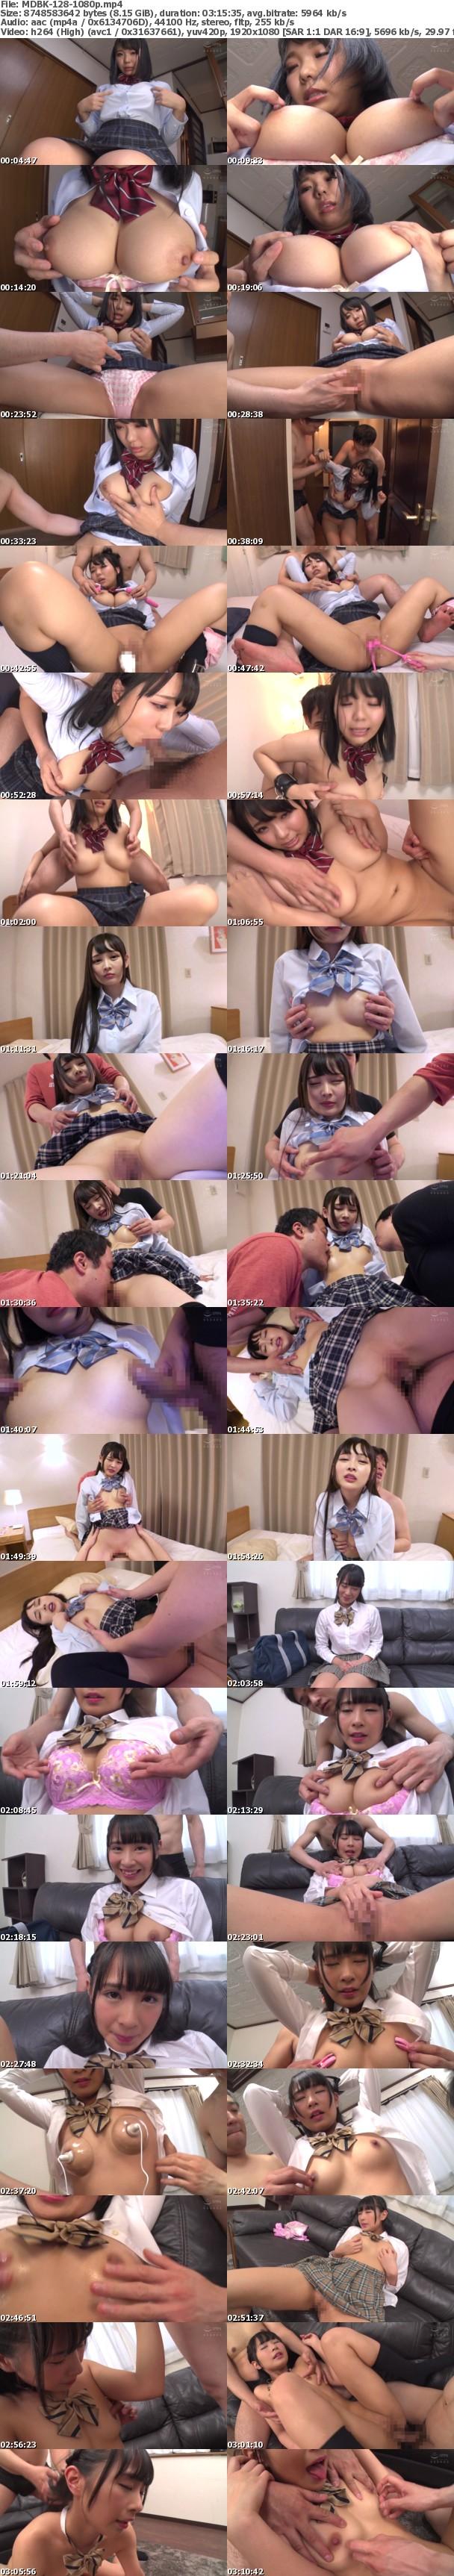 (Full HD) MDBK-128 女子●生の超敏感な乳首をイジくりまくり感度MAXで激イキSEX!2